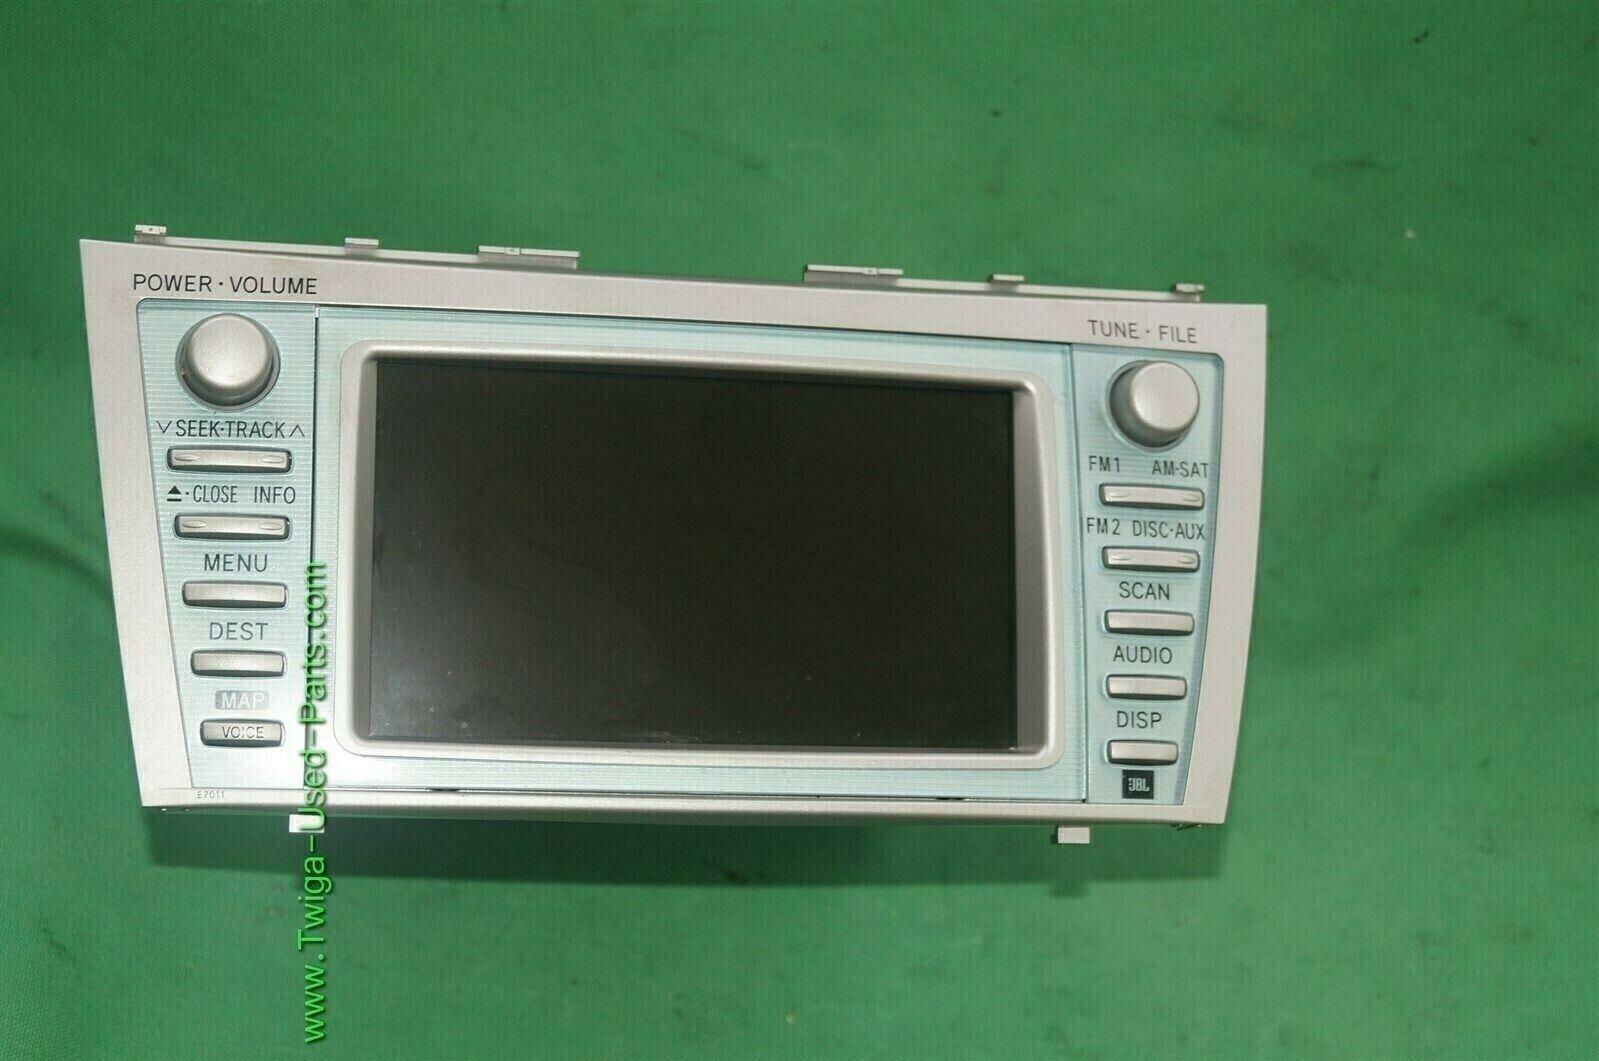 07 08 09 Toyota Camry Hybrid Denso Navigation CD Player Radio 86120-06460